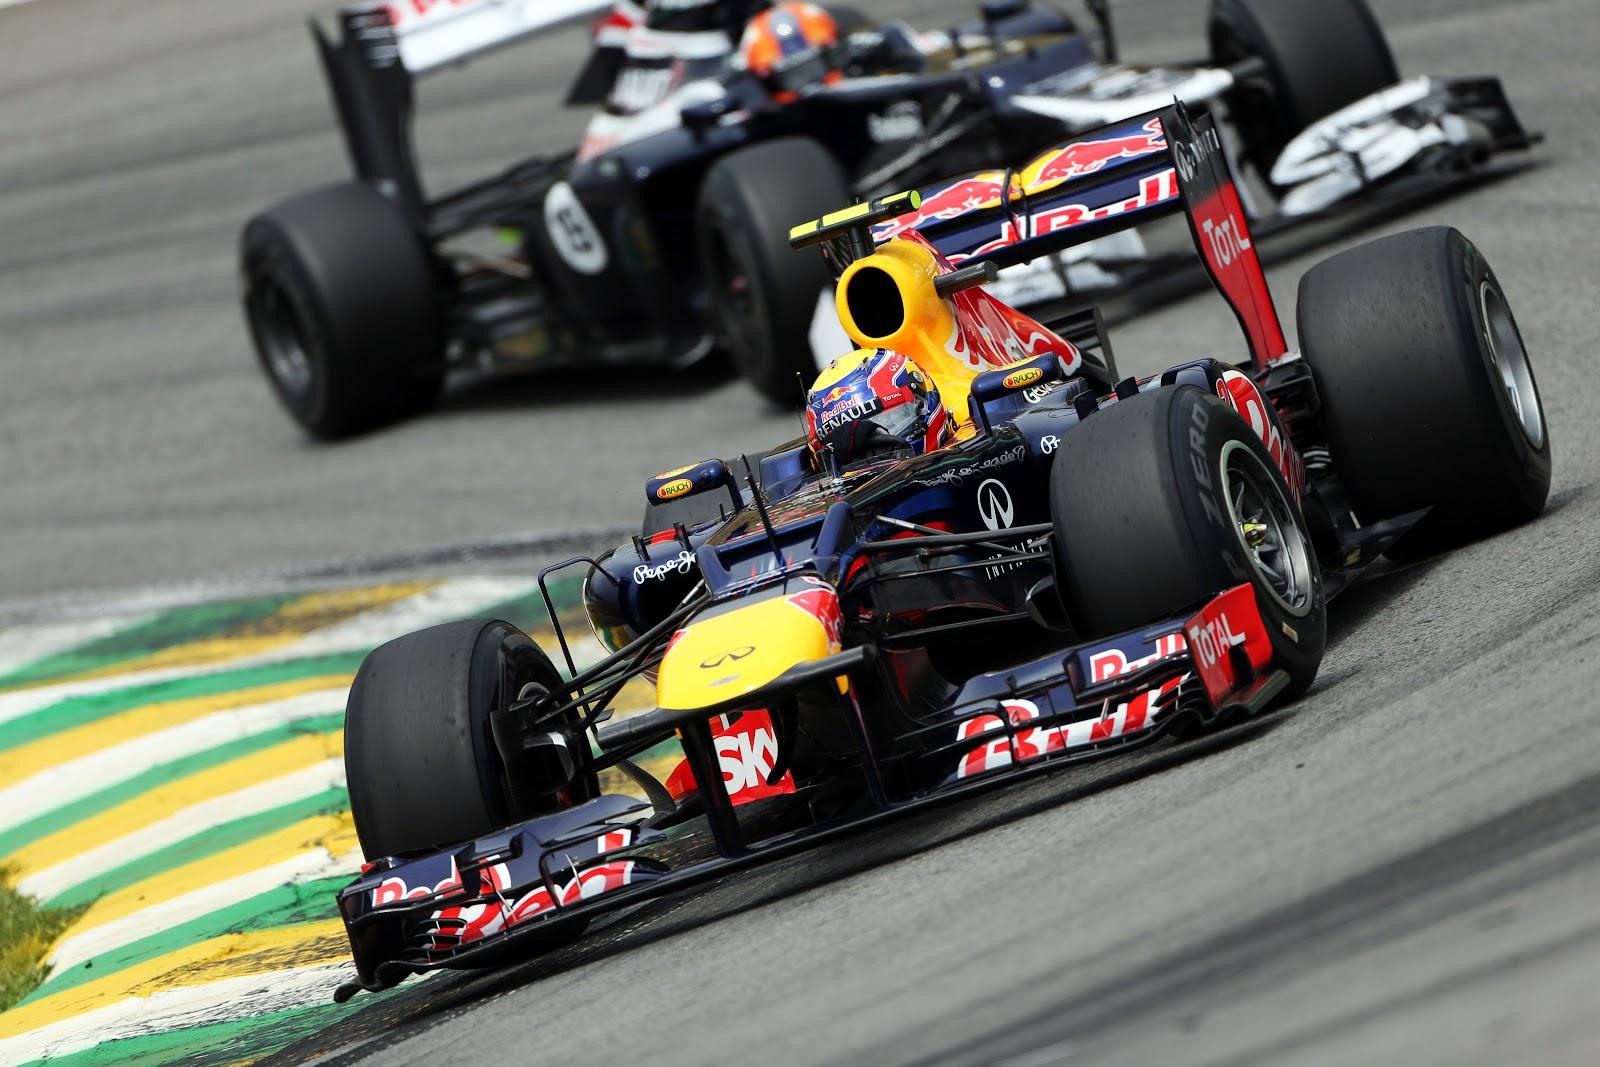 http://3.bp.blogspot.com/-BvMeapY5FX4/ULEs16vyAAI/AAAAAAAAw-A/bV2w02K6aPk/s1600/Mark+Webber+(AUS)+Red+Bull+Racing+RB8..jpg